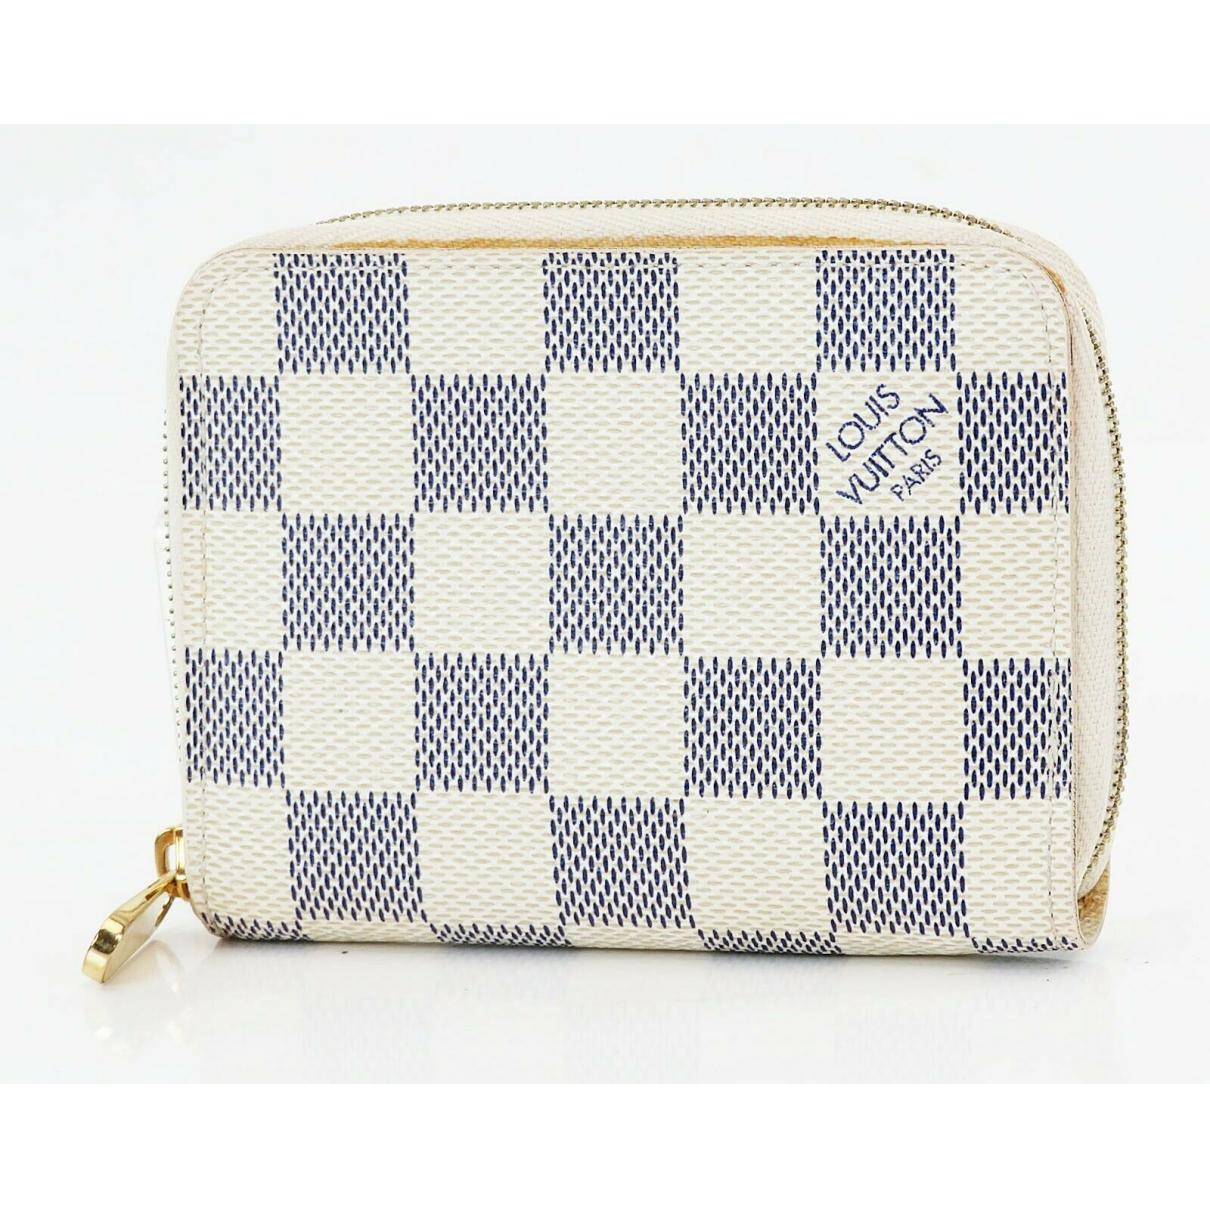 Louis Vuitton \N Leather Purses, wallet & cases for Women \N